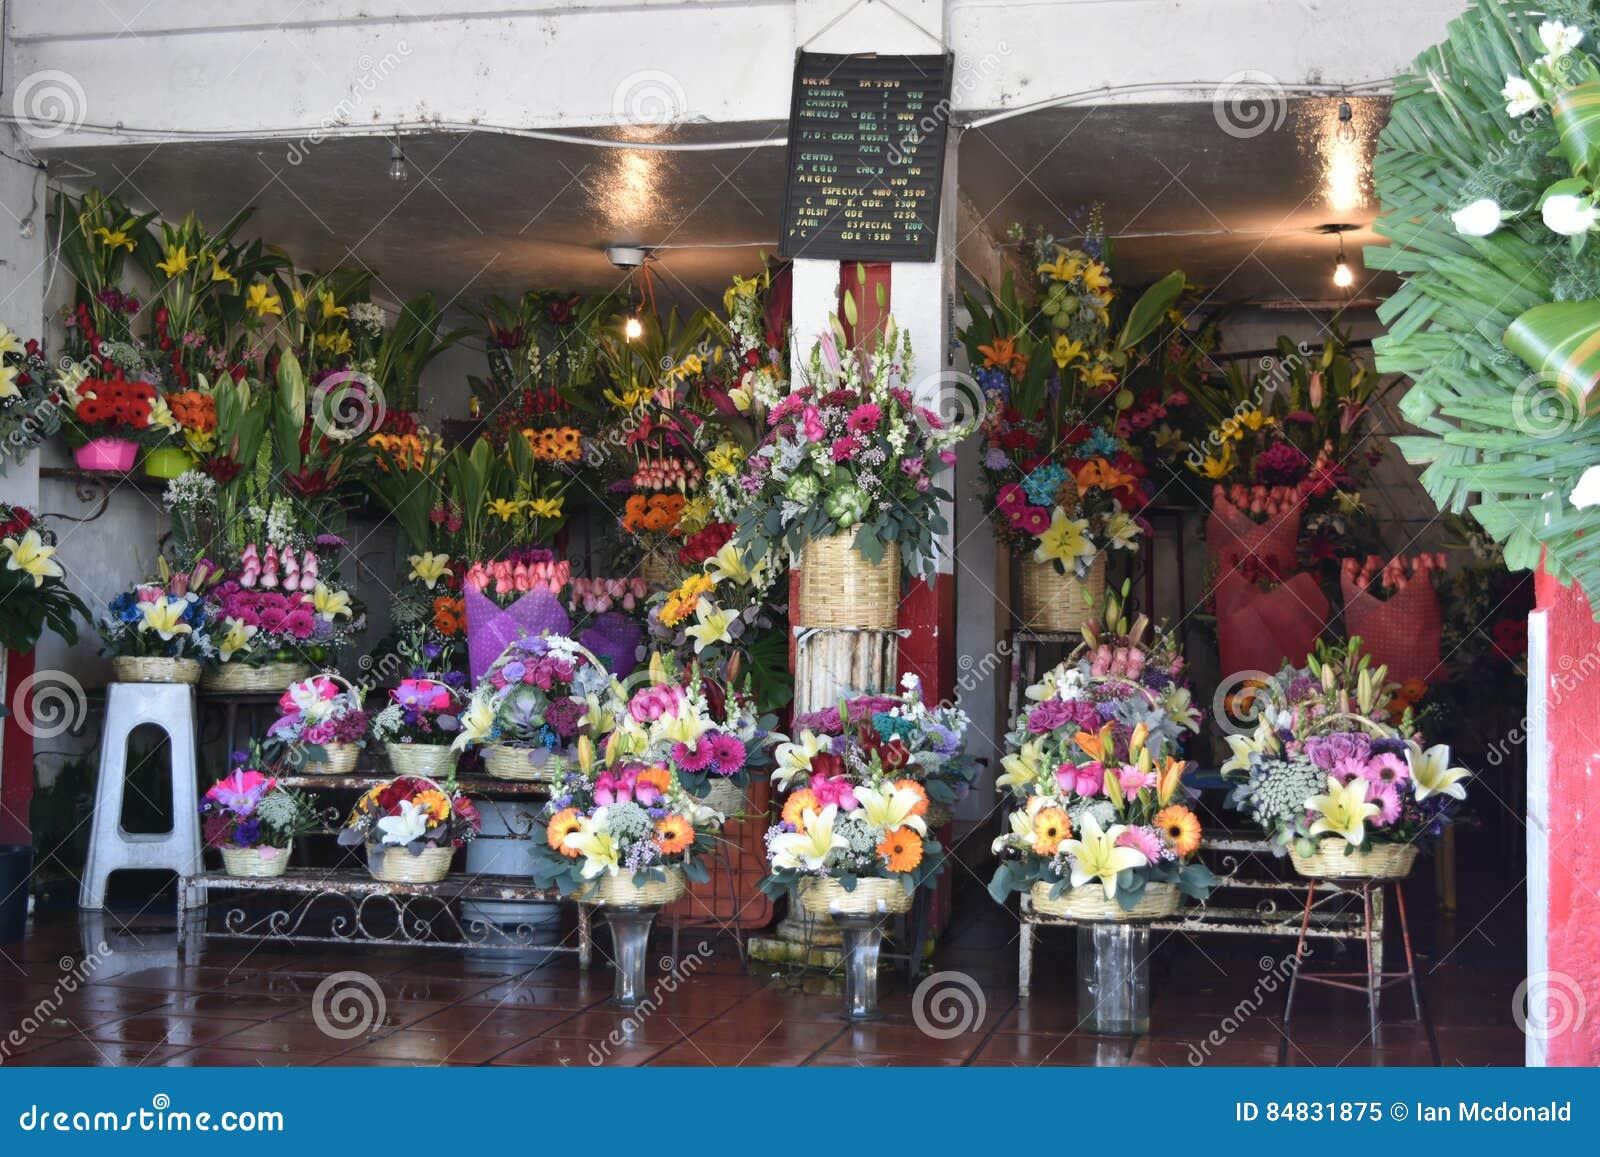 Mexican flower shop stock image image of store tienda 84831875 mexican flower shop izmirmasajfo